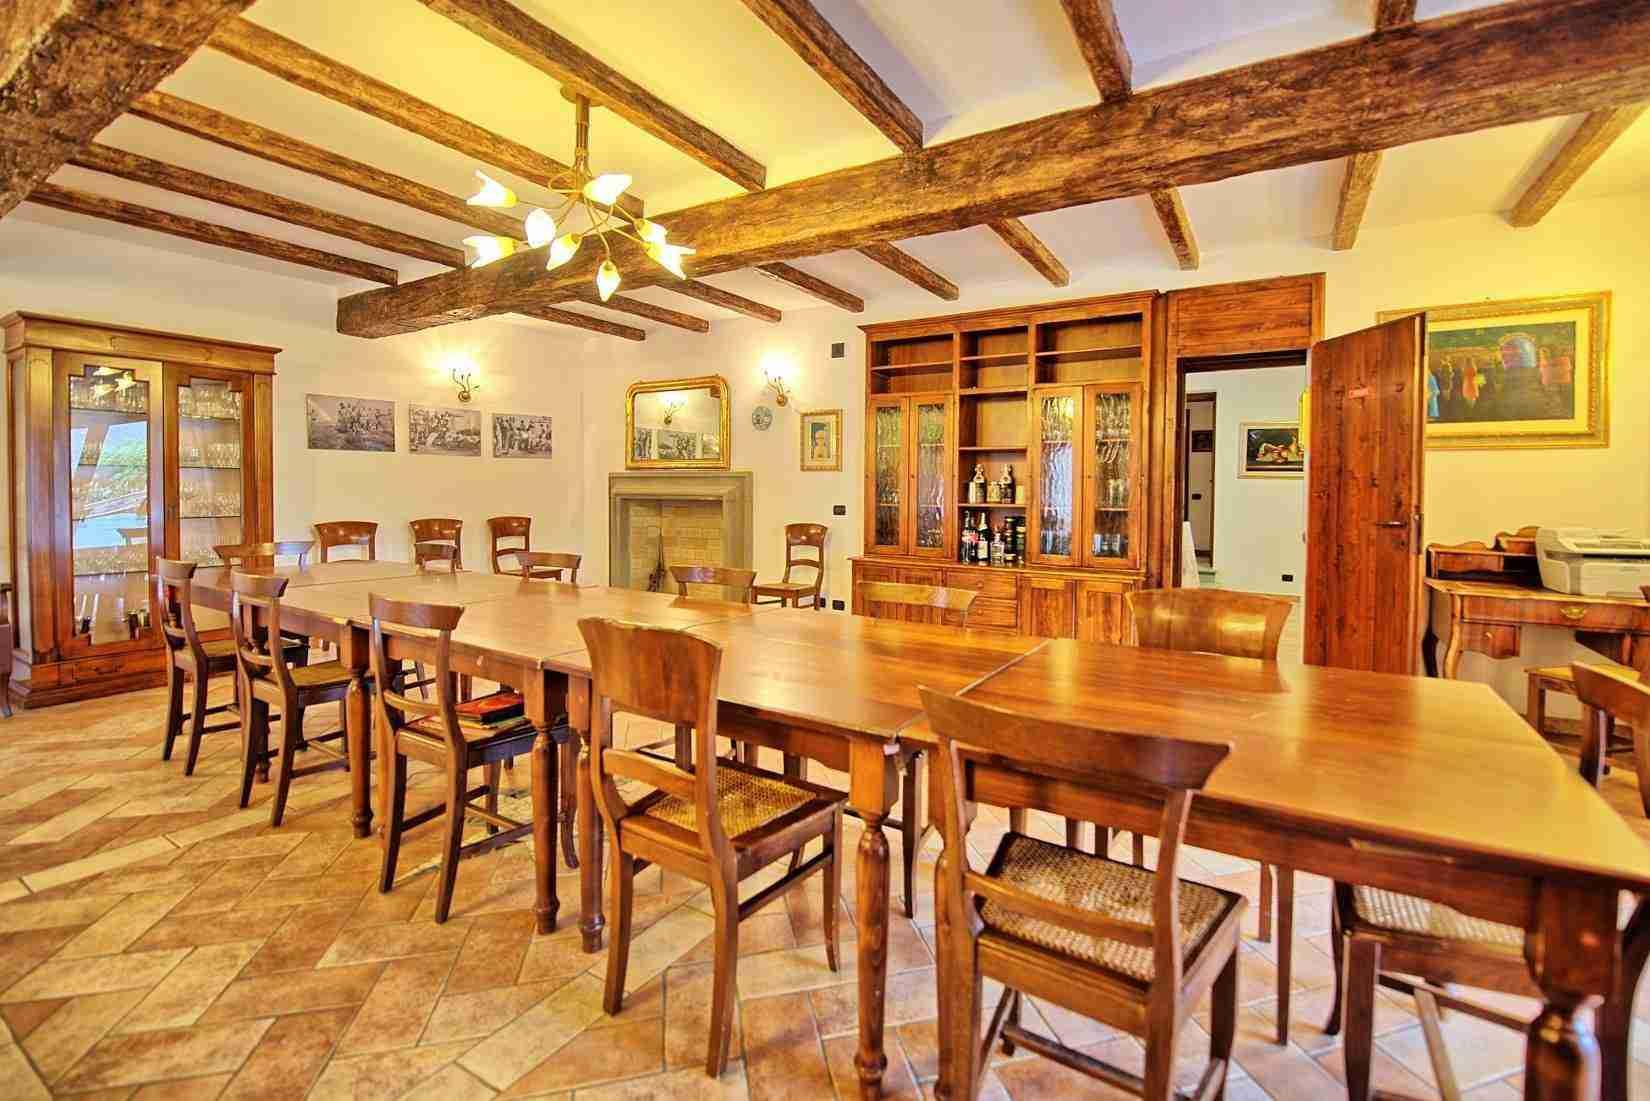 36 Etruria dining room